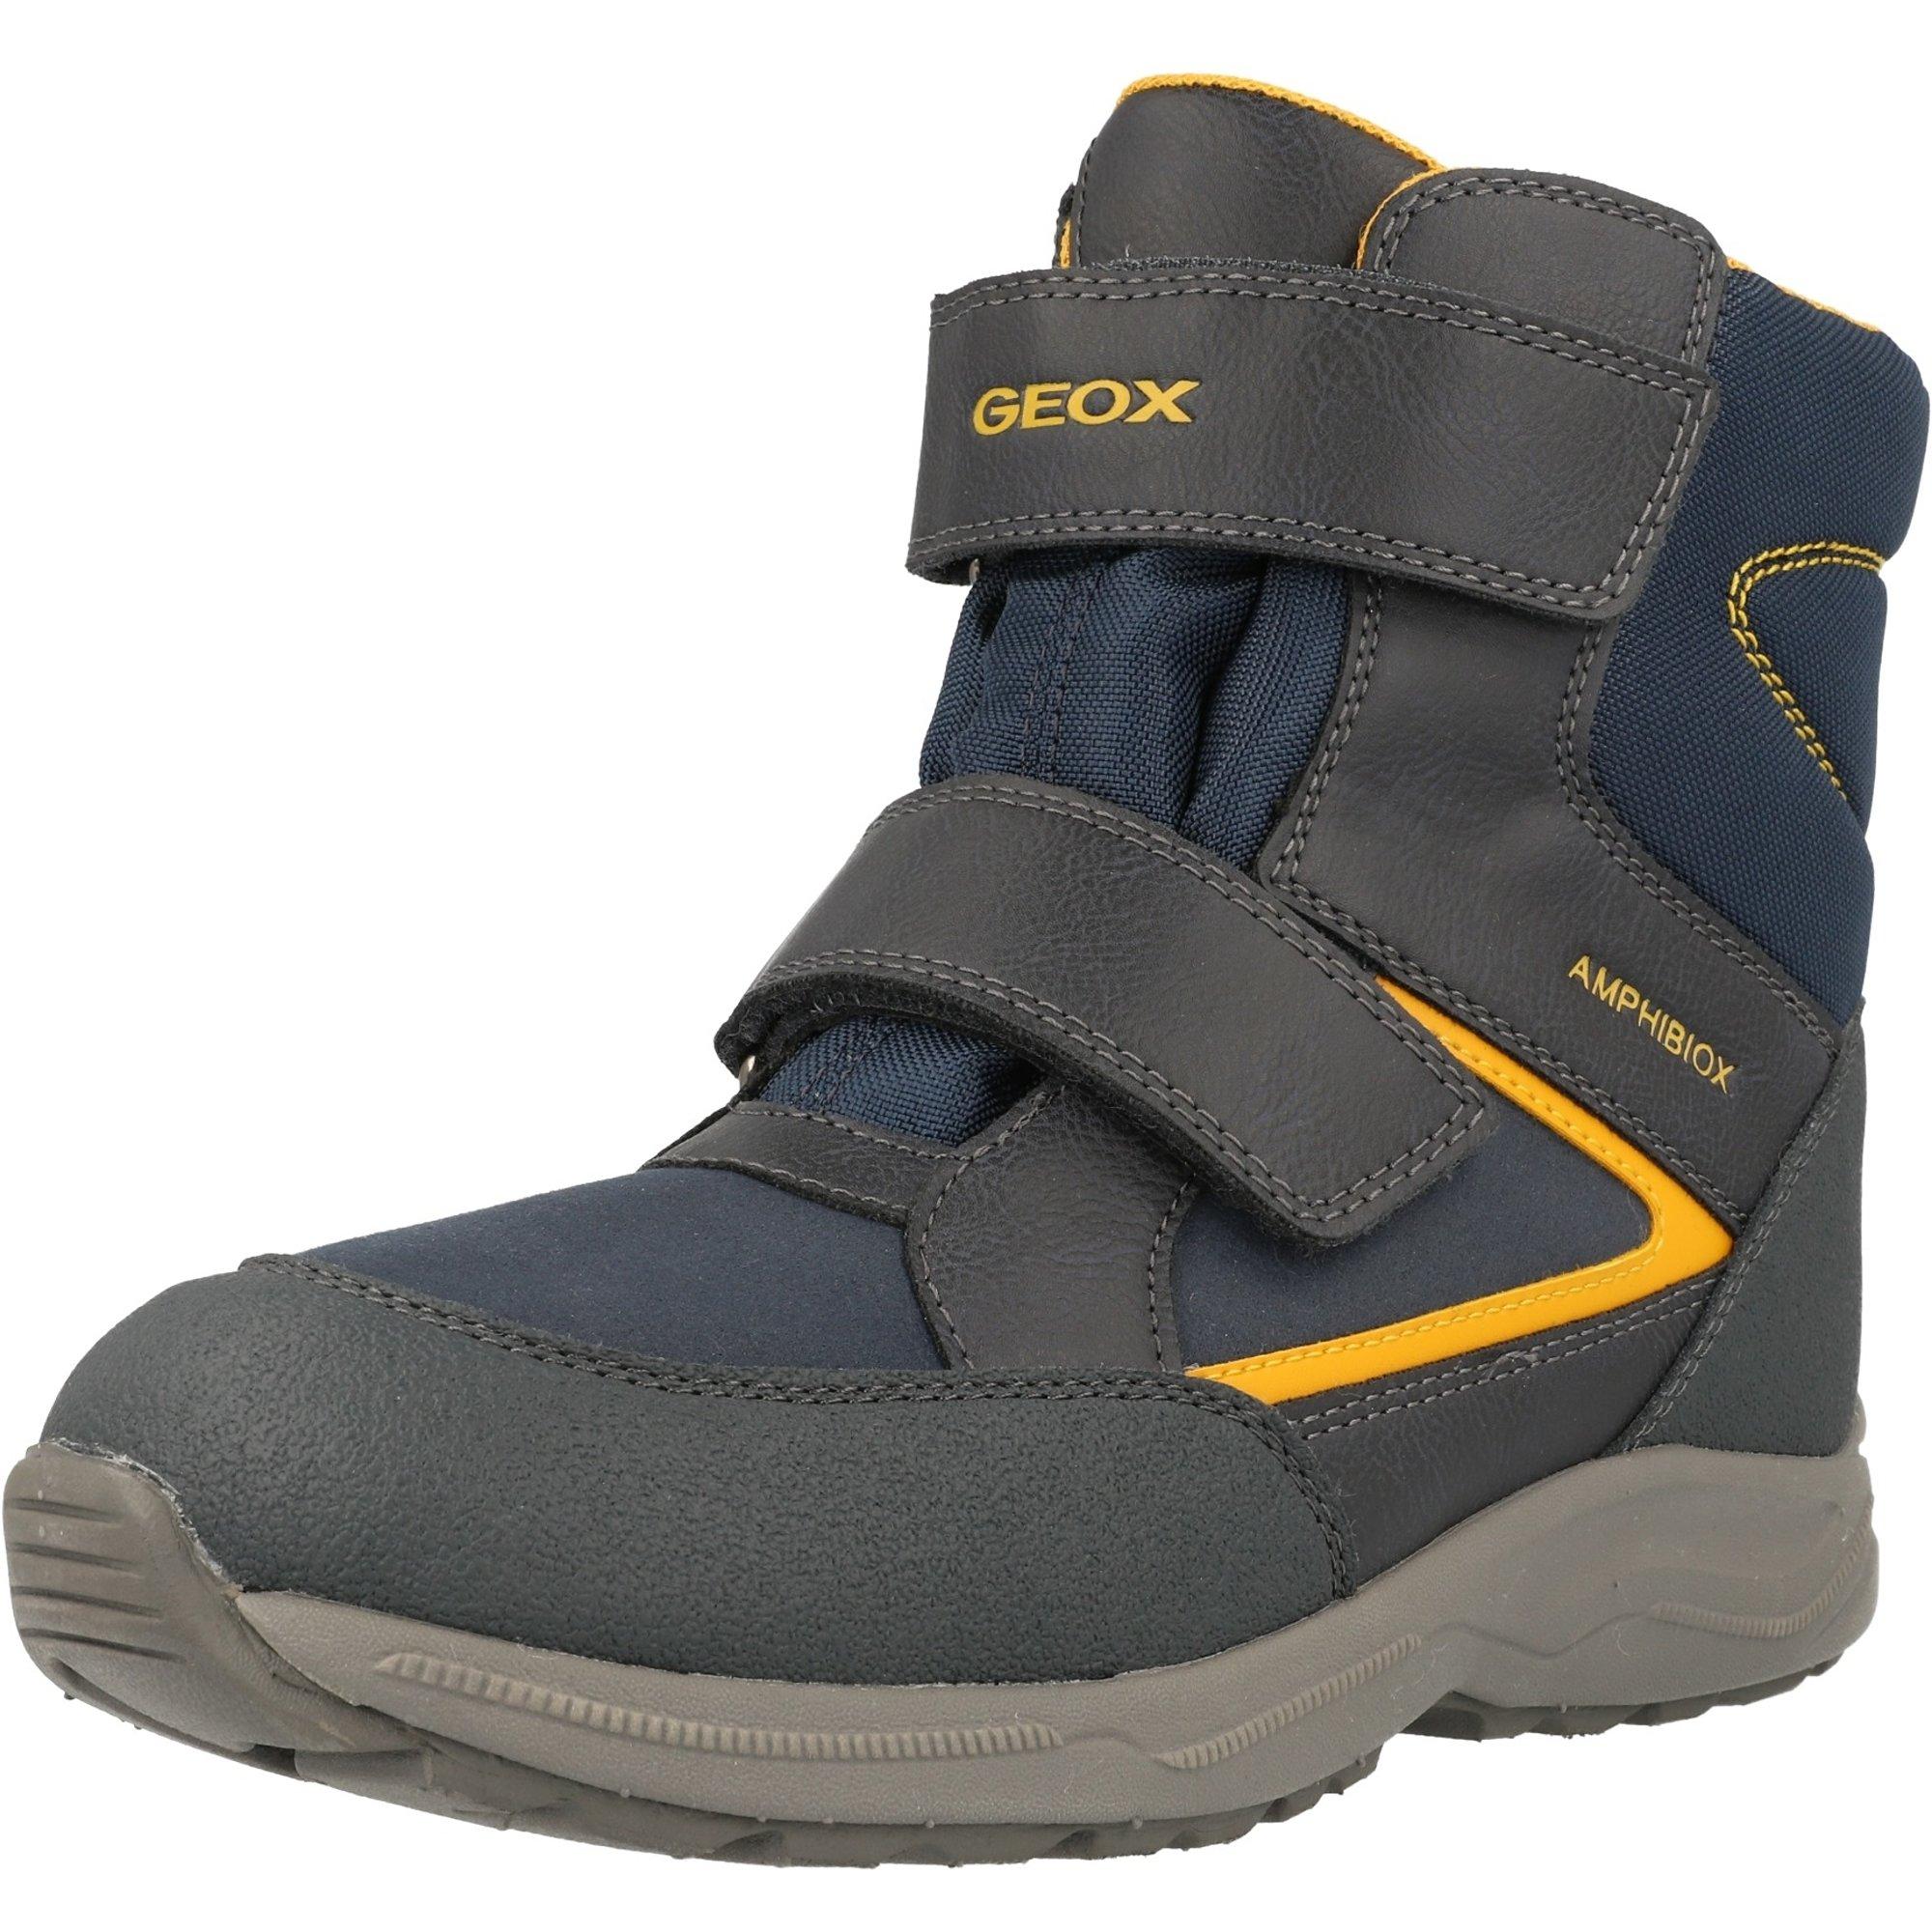 zapatos geox argentina gratis 2018